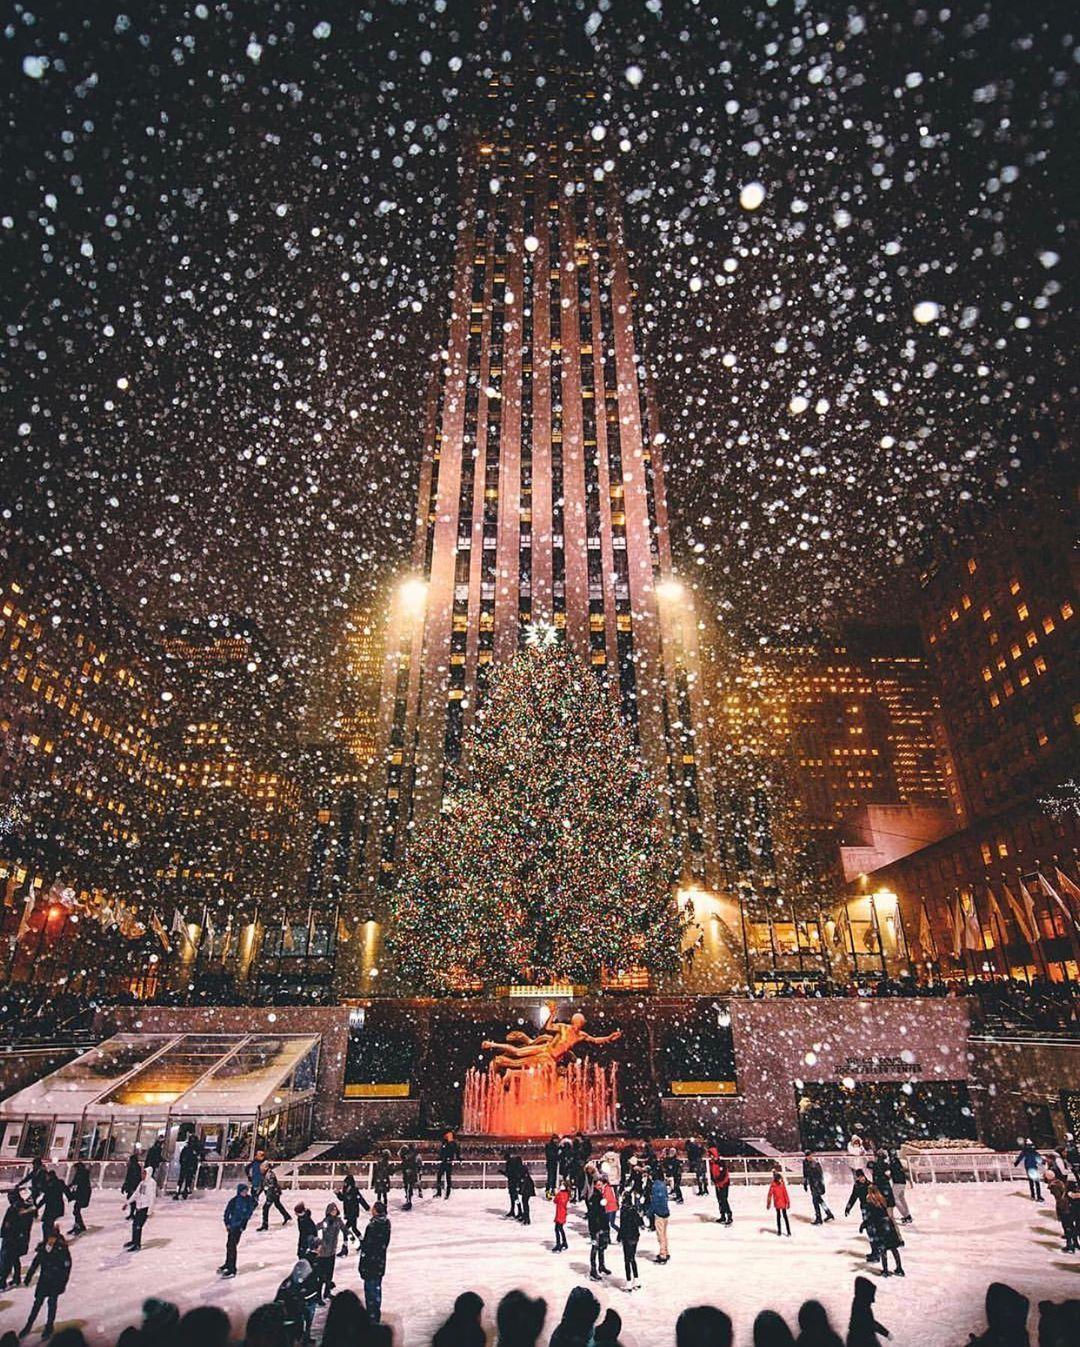 15 Restaurants Worth Traveling to LONDON City for.   nycchristmas #christmasscenes #christmaslights #merrychristmas #newyorkchristmastime #christmasinnewyork #christmasdecor #newyorknoel #photographienewyork